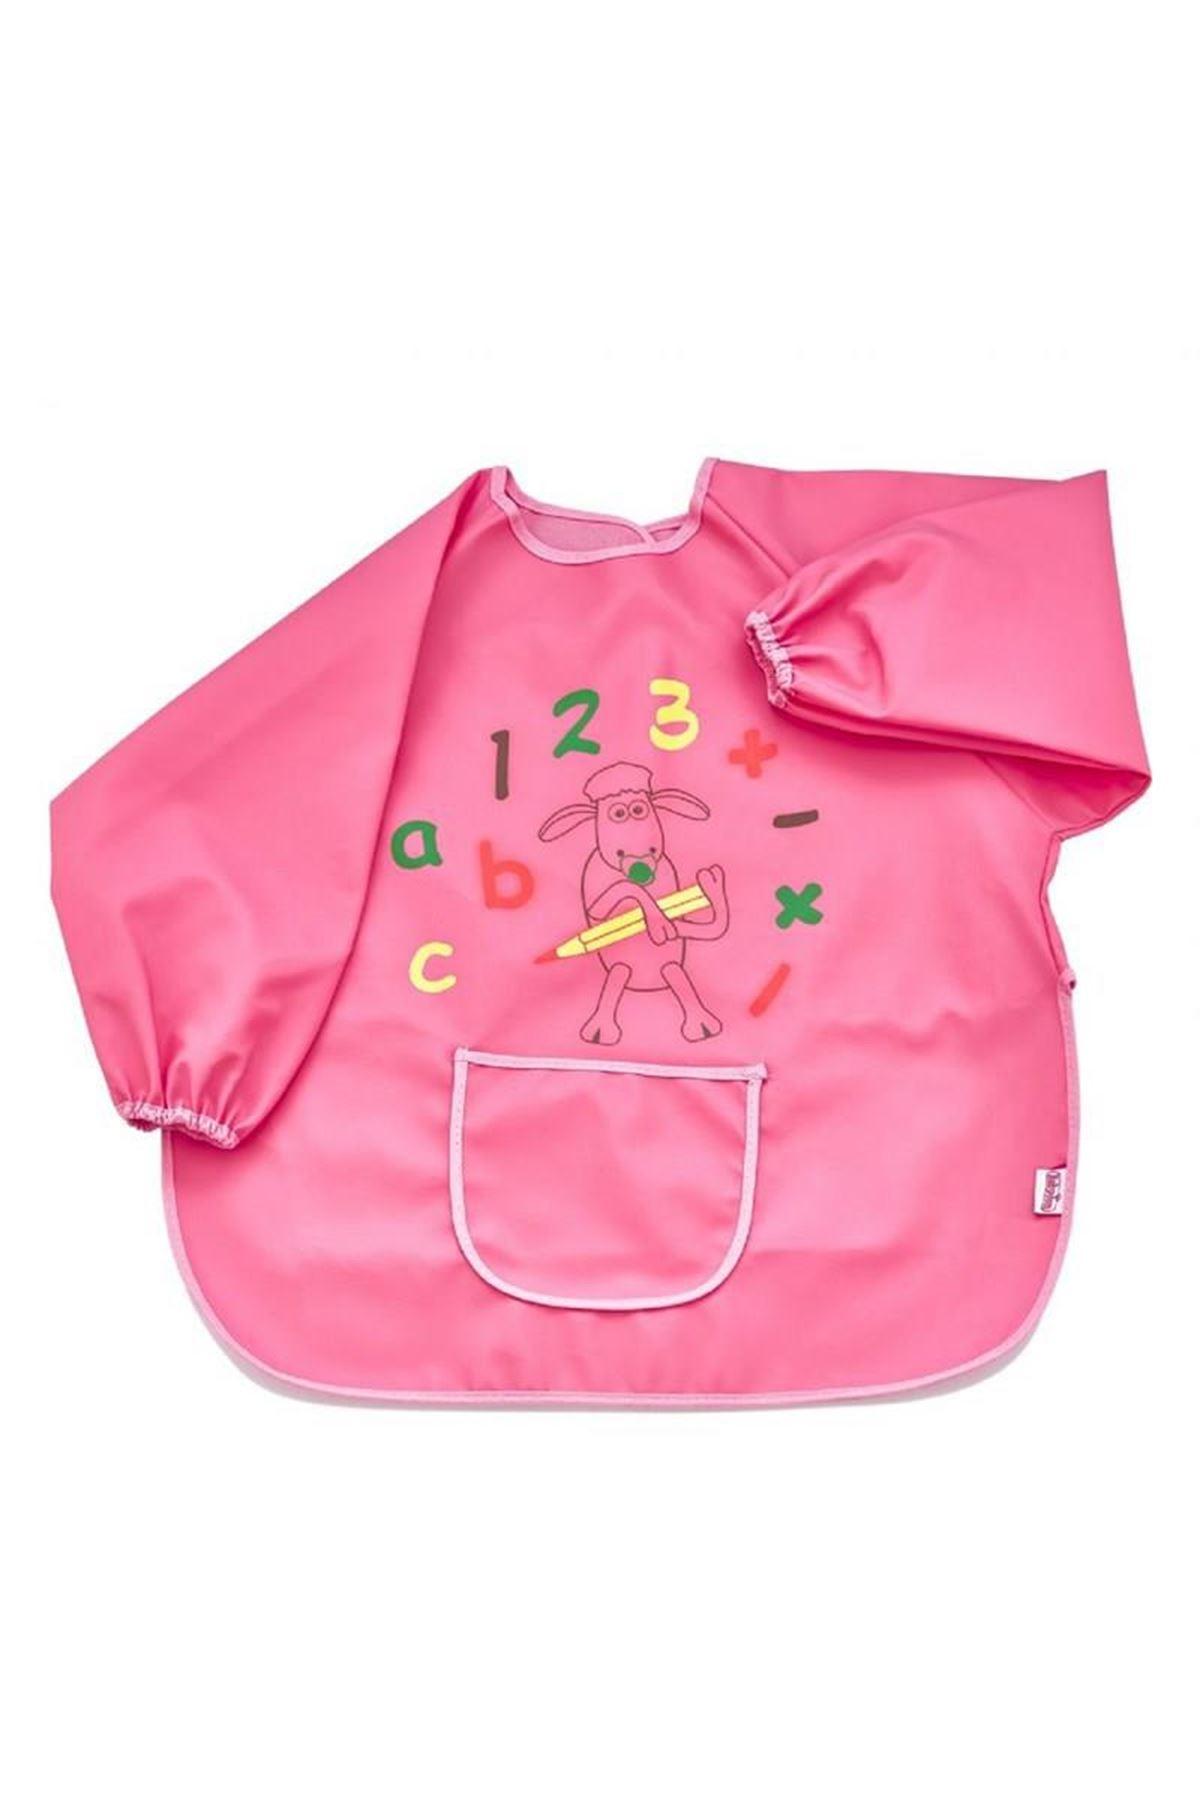 BabyJem Bebek Faaliyet Önlüğü Kollu 049 Pembe